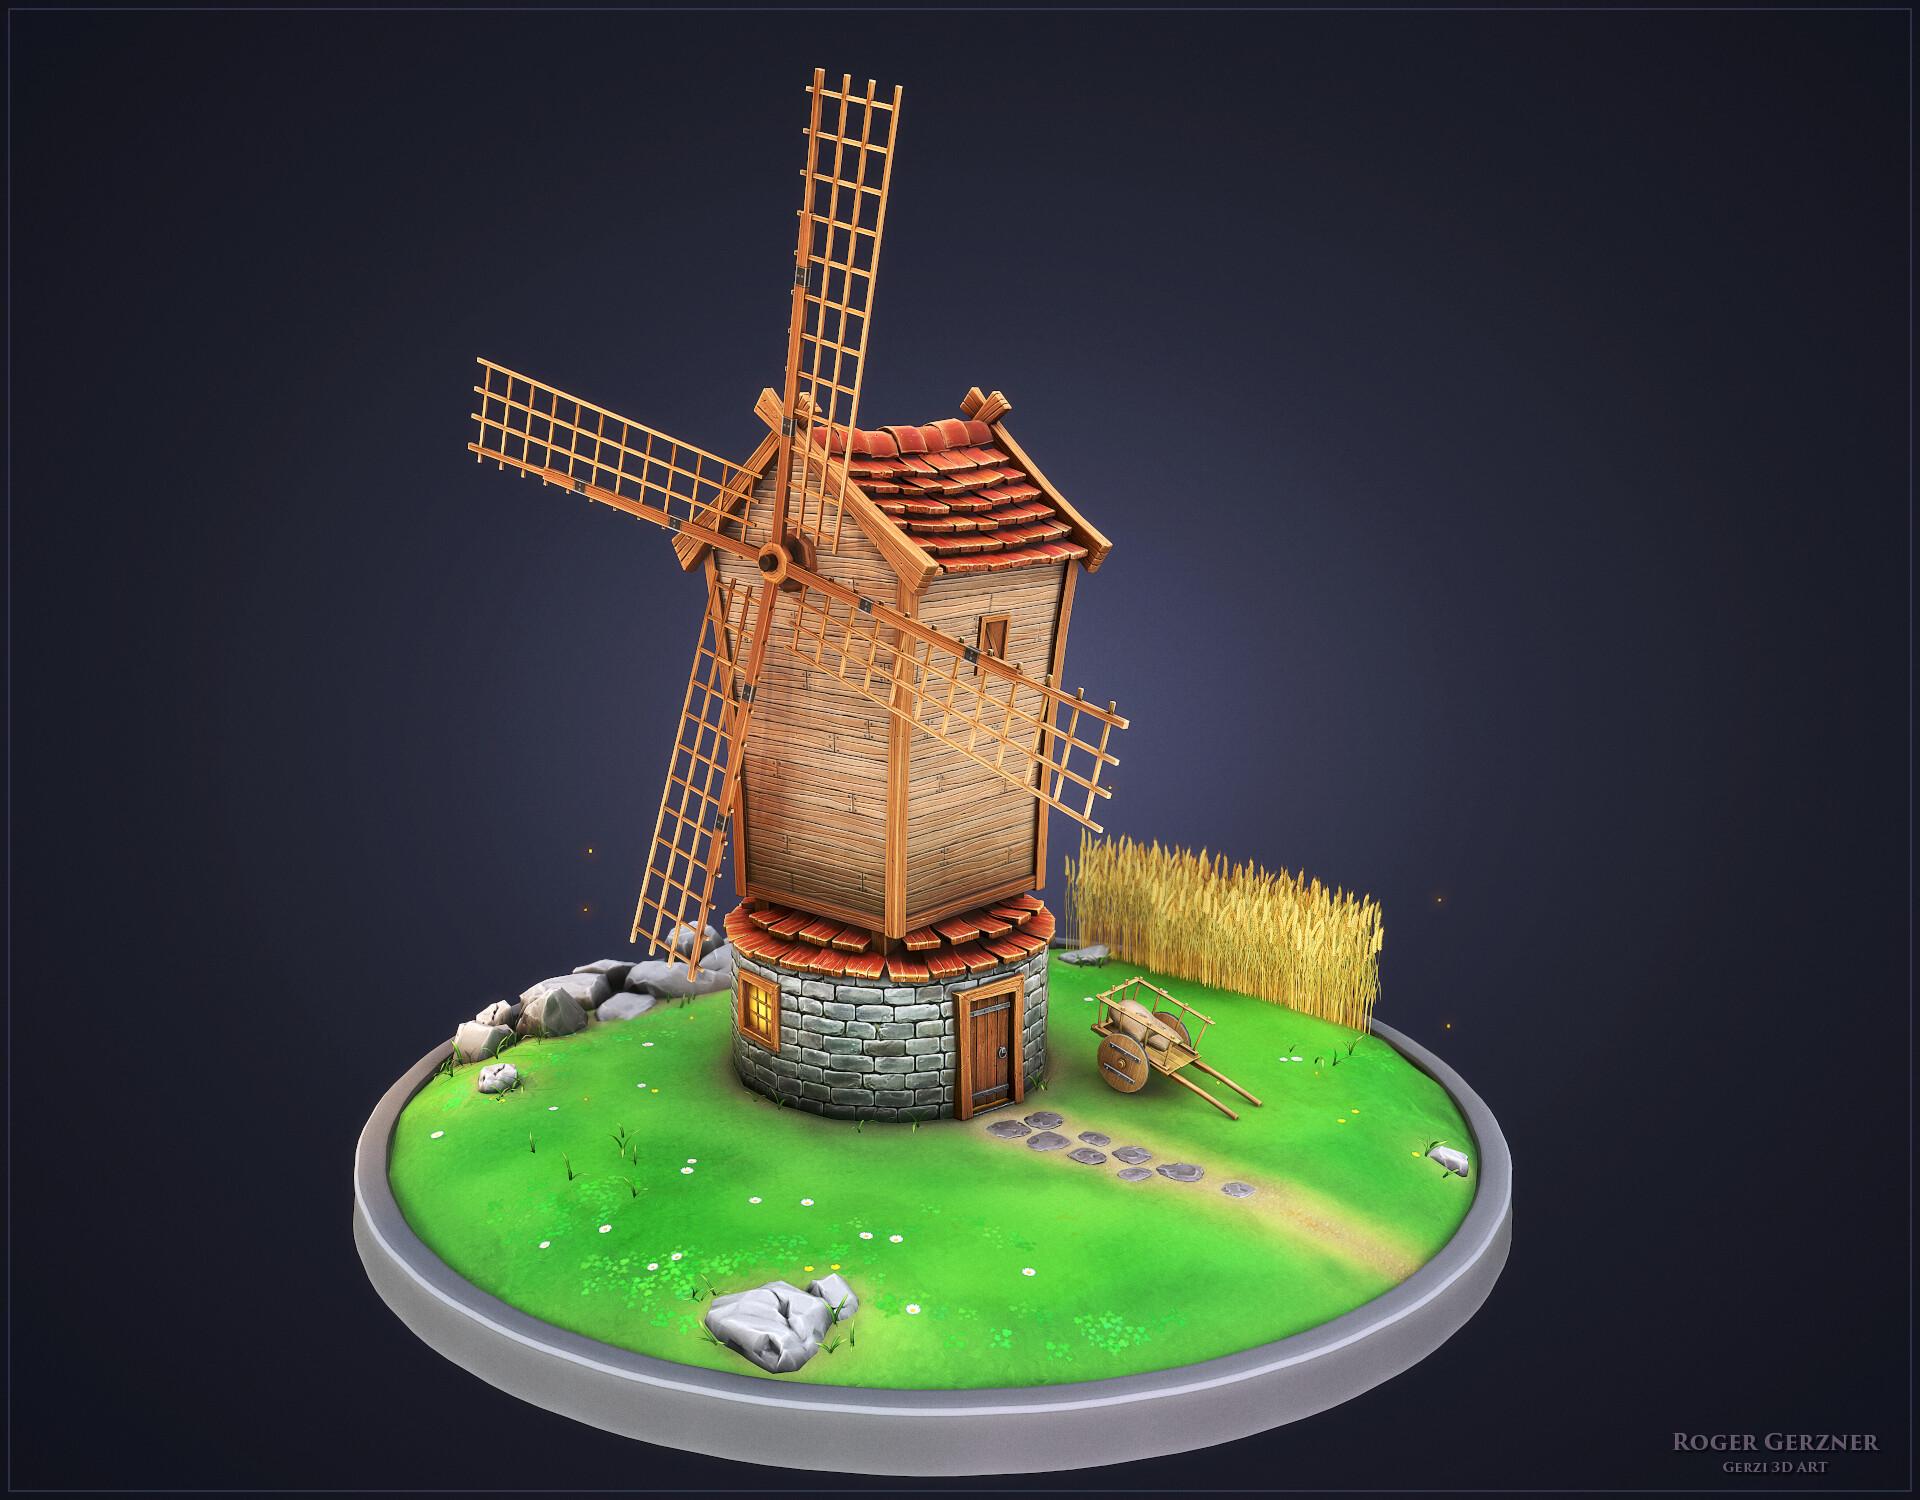 Roger gerzner rogergerzner windmill 01